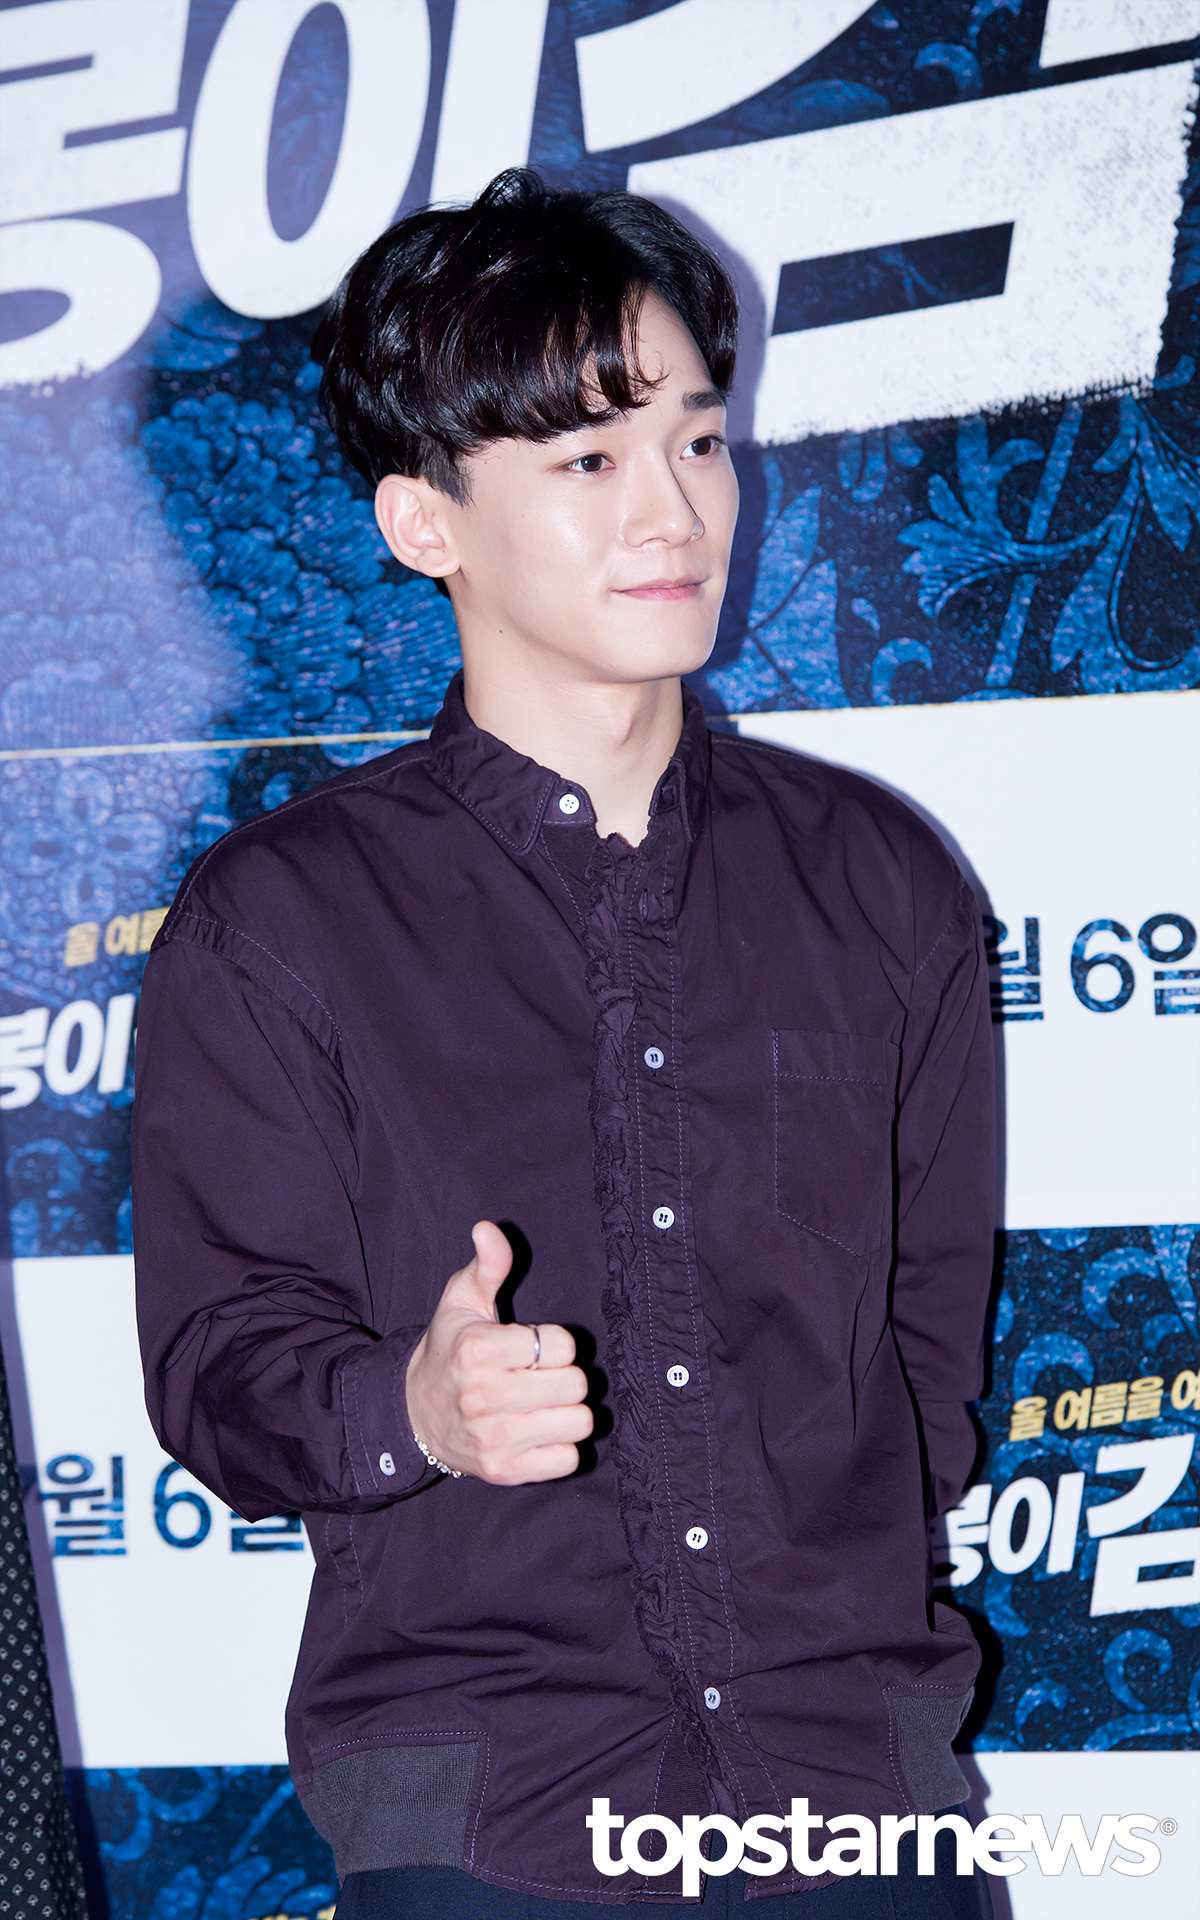 EXO - Chen EXO除了伯賢之外還有一位唱功了得,笑起來有超可愛八字眉的主唱Chen阿~人家可是唱過《太陽的後裔》的OST阿~